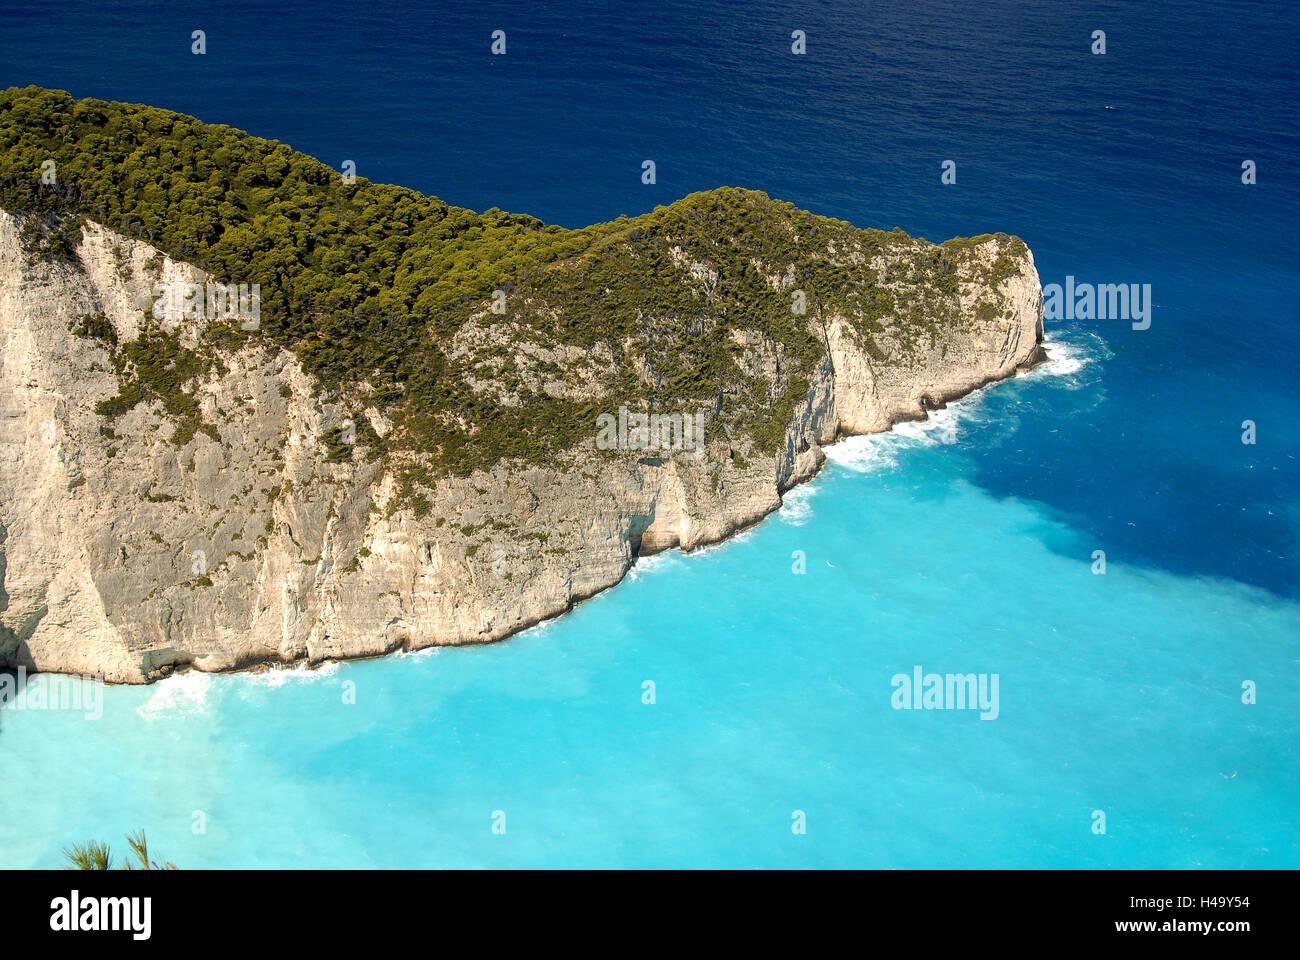 Navagio beach, Zakinthos, Greece Stock Photo